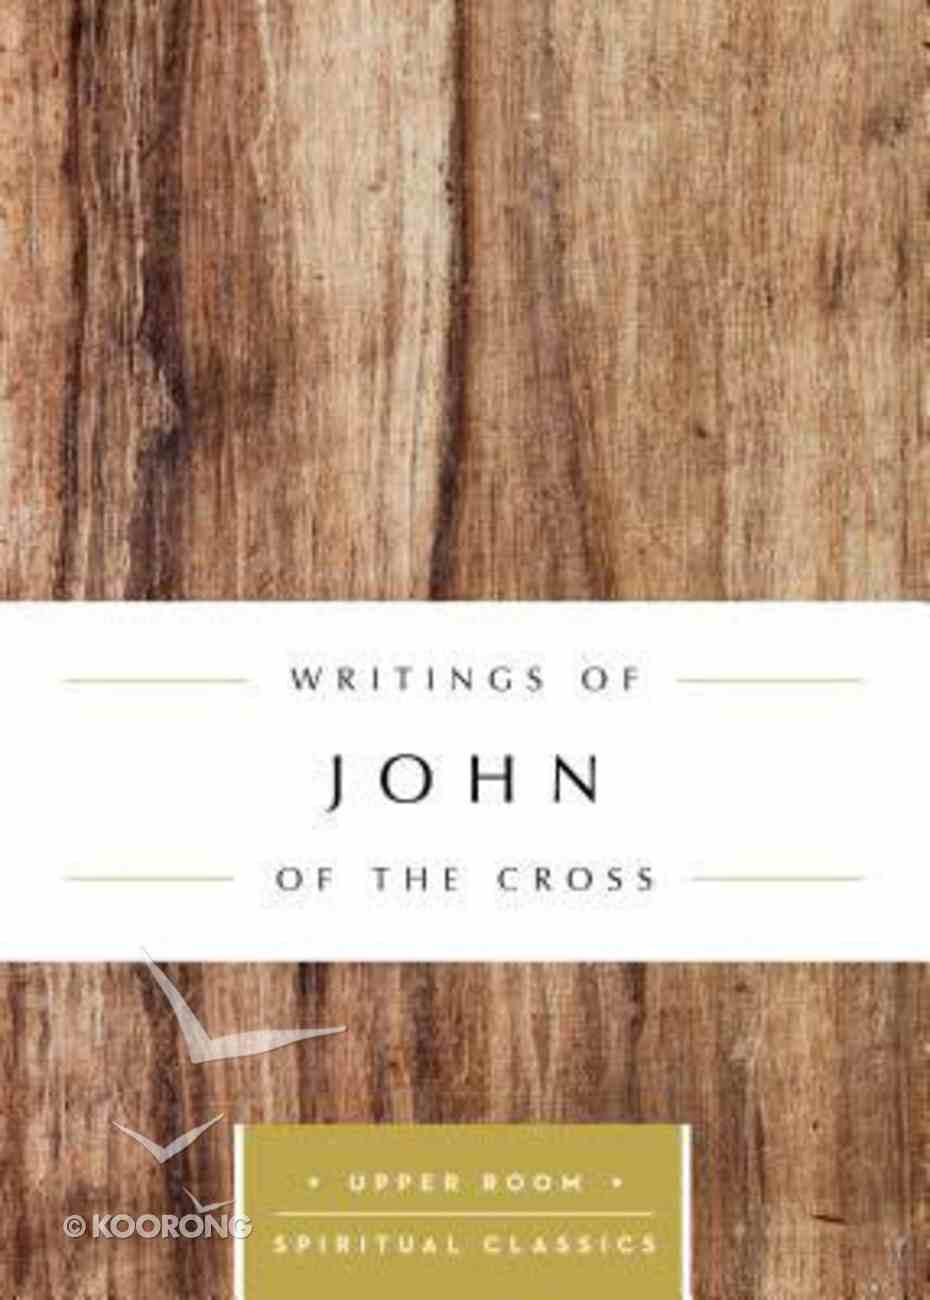 Writings of John of the Cross (Upper Room Spiritual Classics Series) Paperback